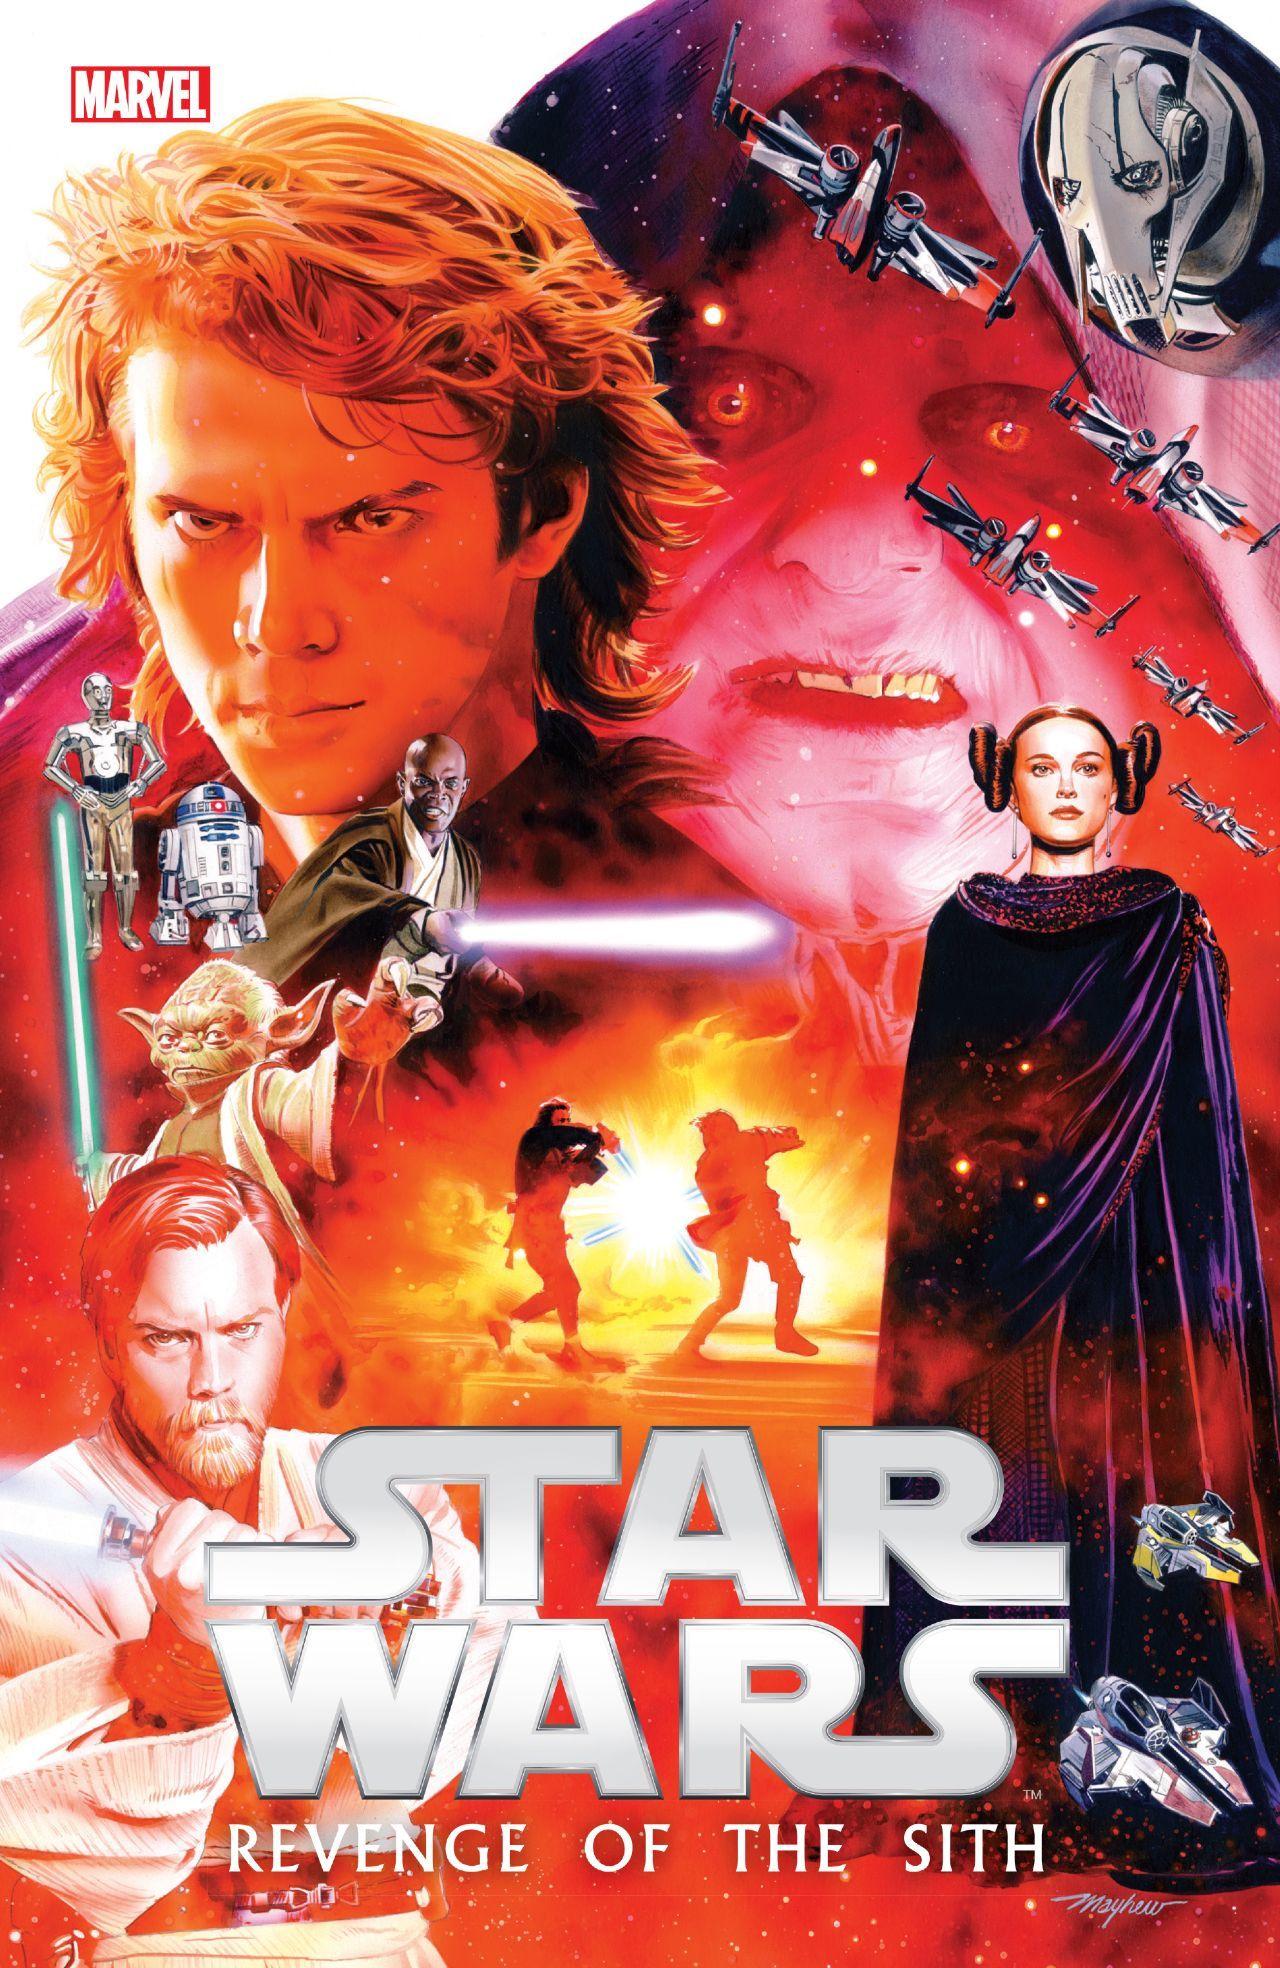 Star Wars Episode Iii Revenge Of The Sith Tpb Marvel Marvel Marvelofficial Starwars Cover Artist Star Wars Poster Star Wars Comics Star Wars History